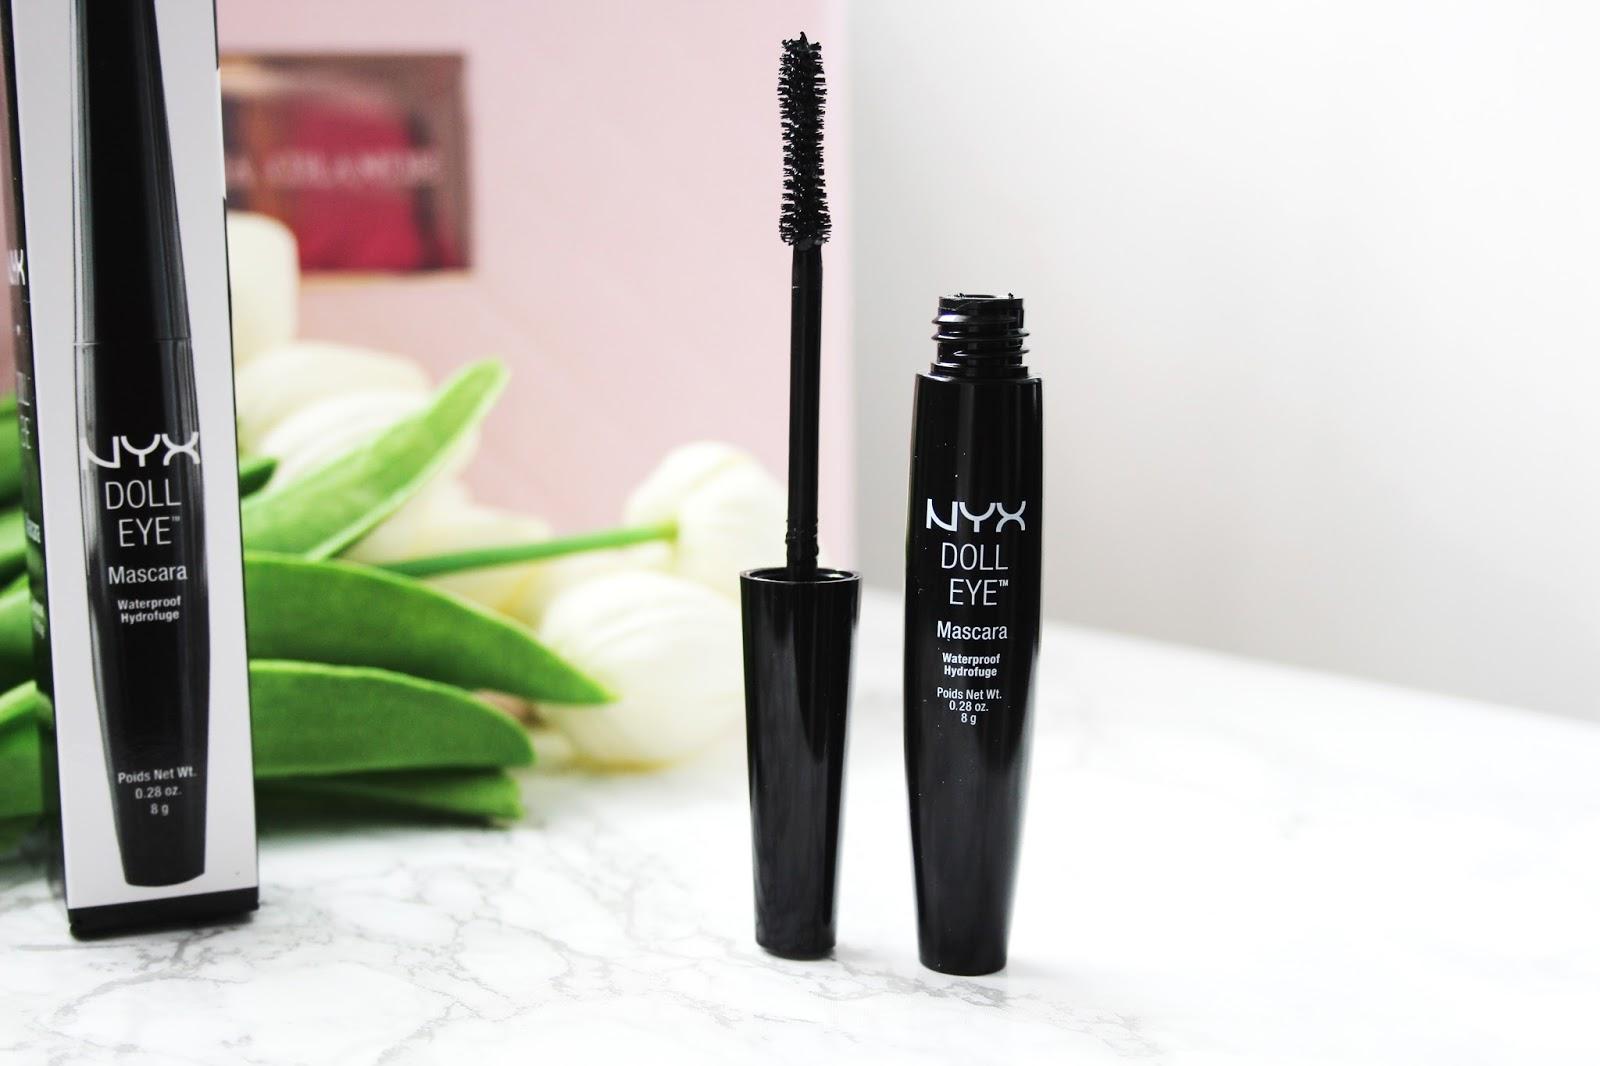 Nyx Doll Eye Mascara Waterproof photos